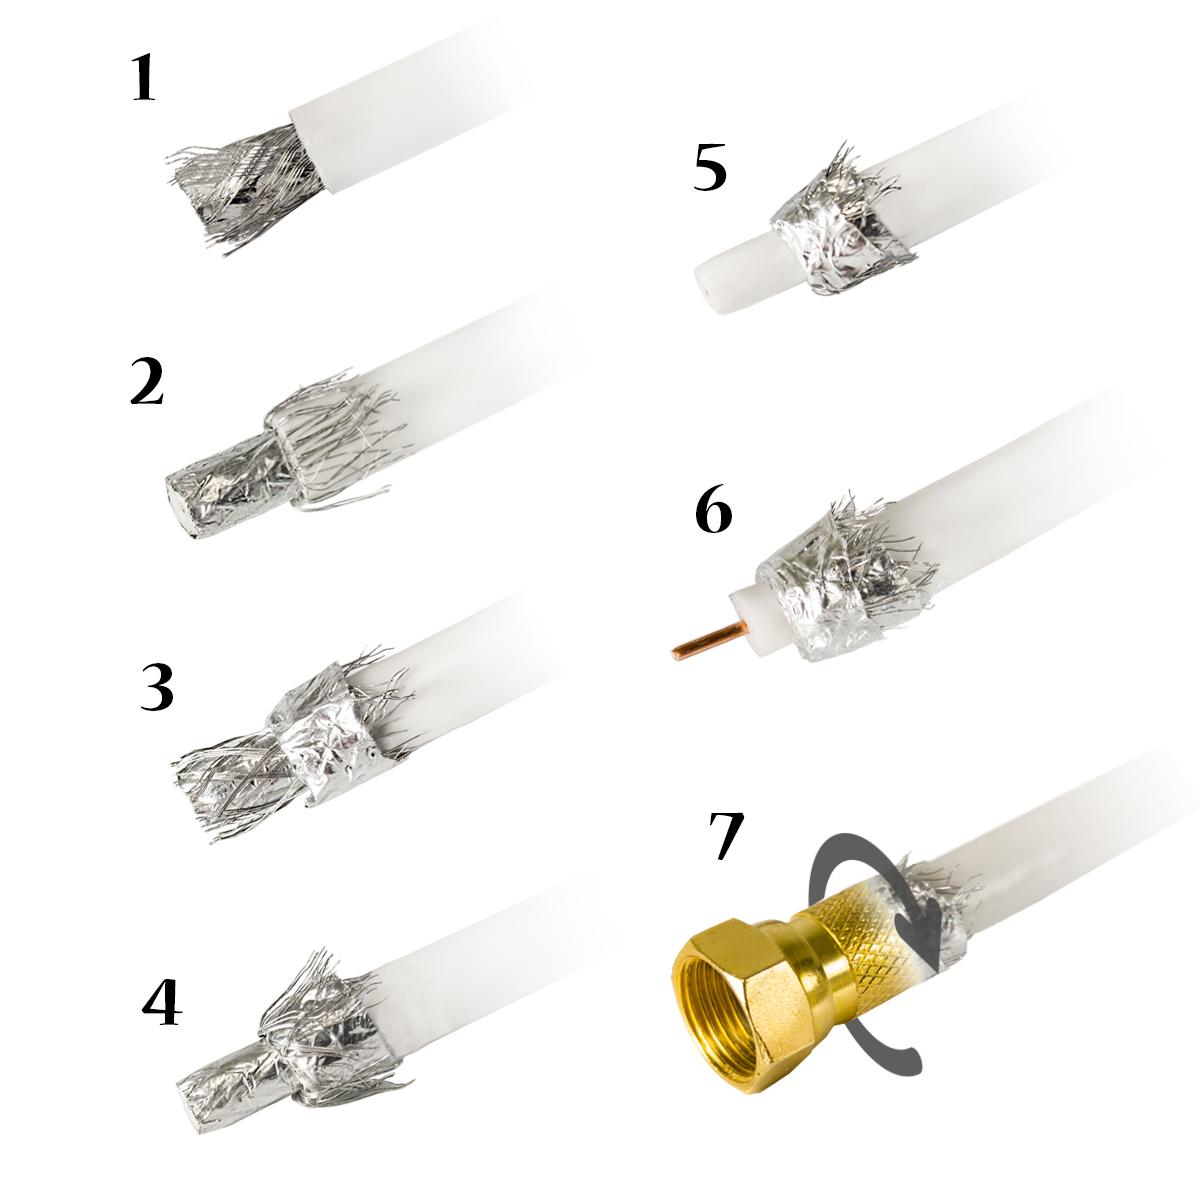 PremiumX BASIC 30m Koaxialkabel 135 dB 4-Fach geschirmt Kupfer-Stahl Satelliten Koaxkabel Antennenkabel Digital SAT TV Kabel